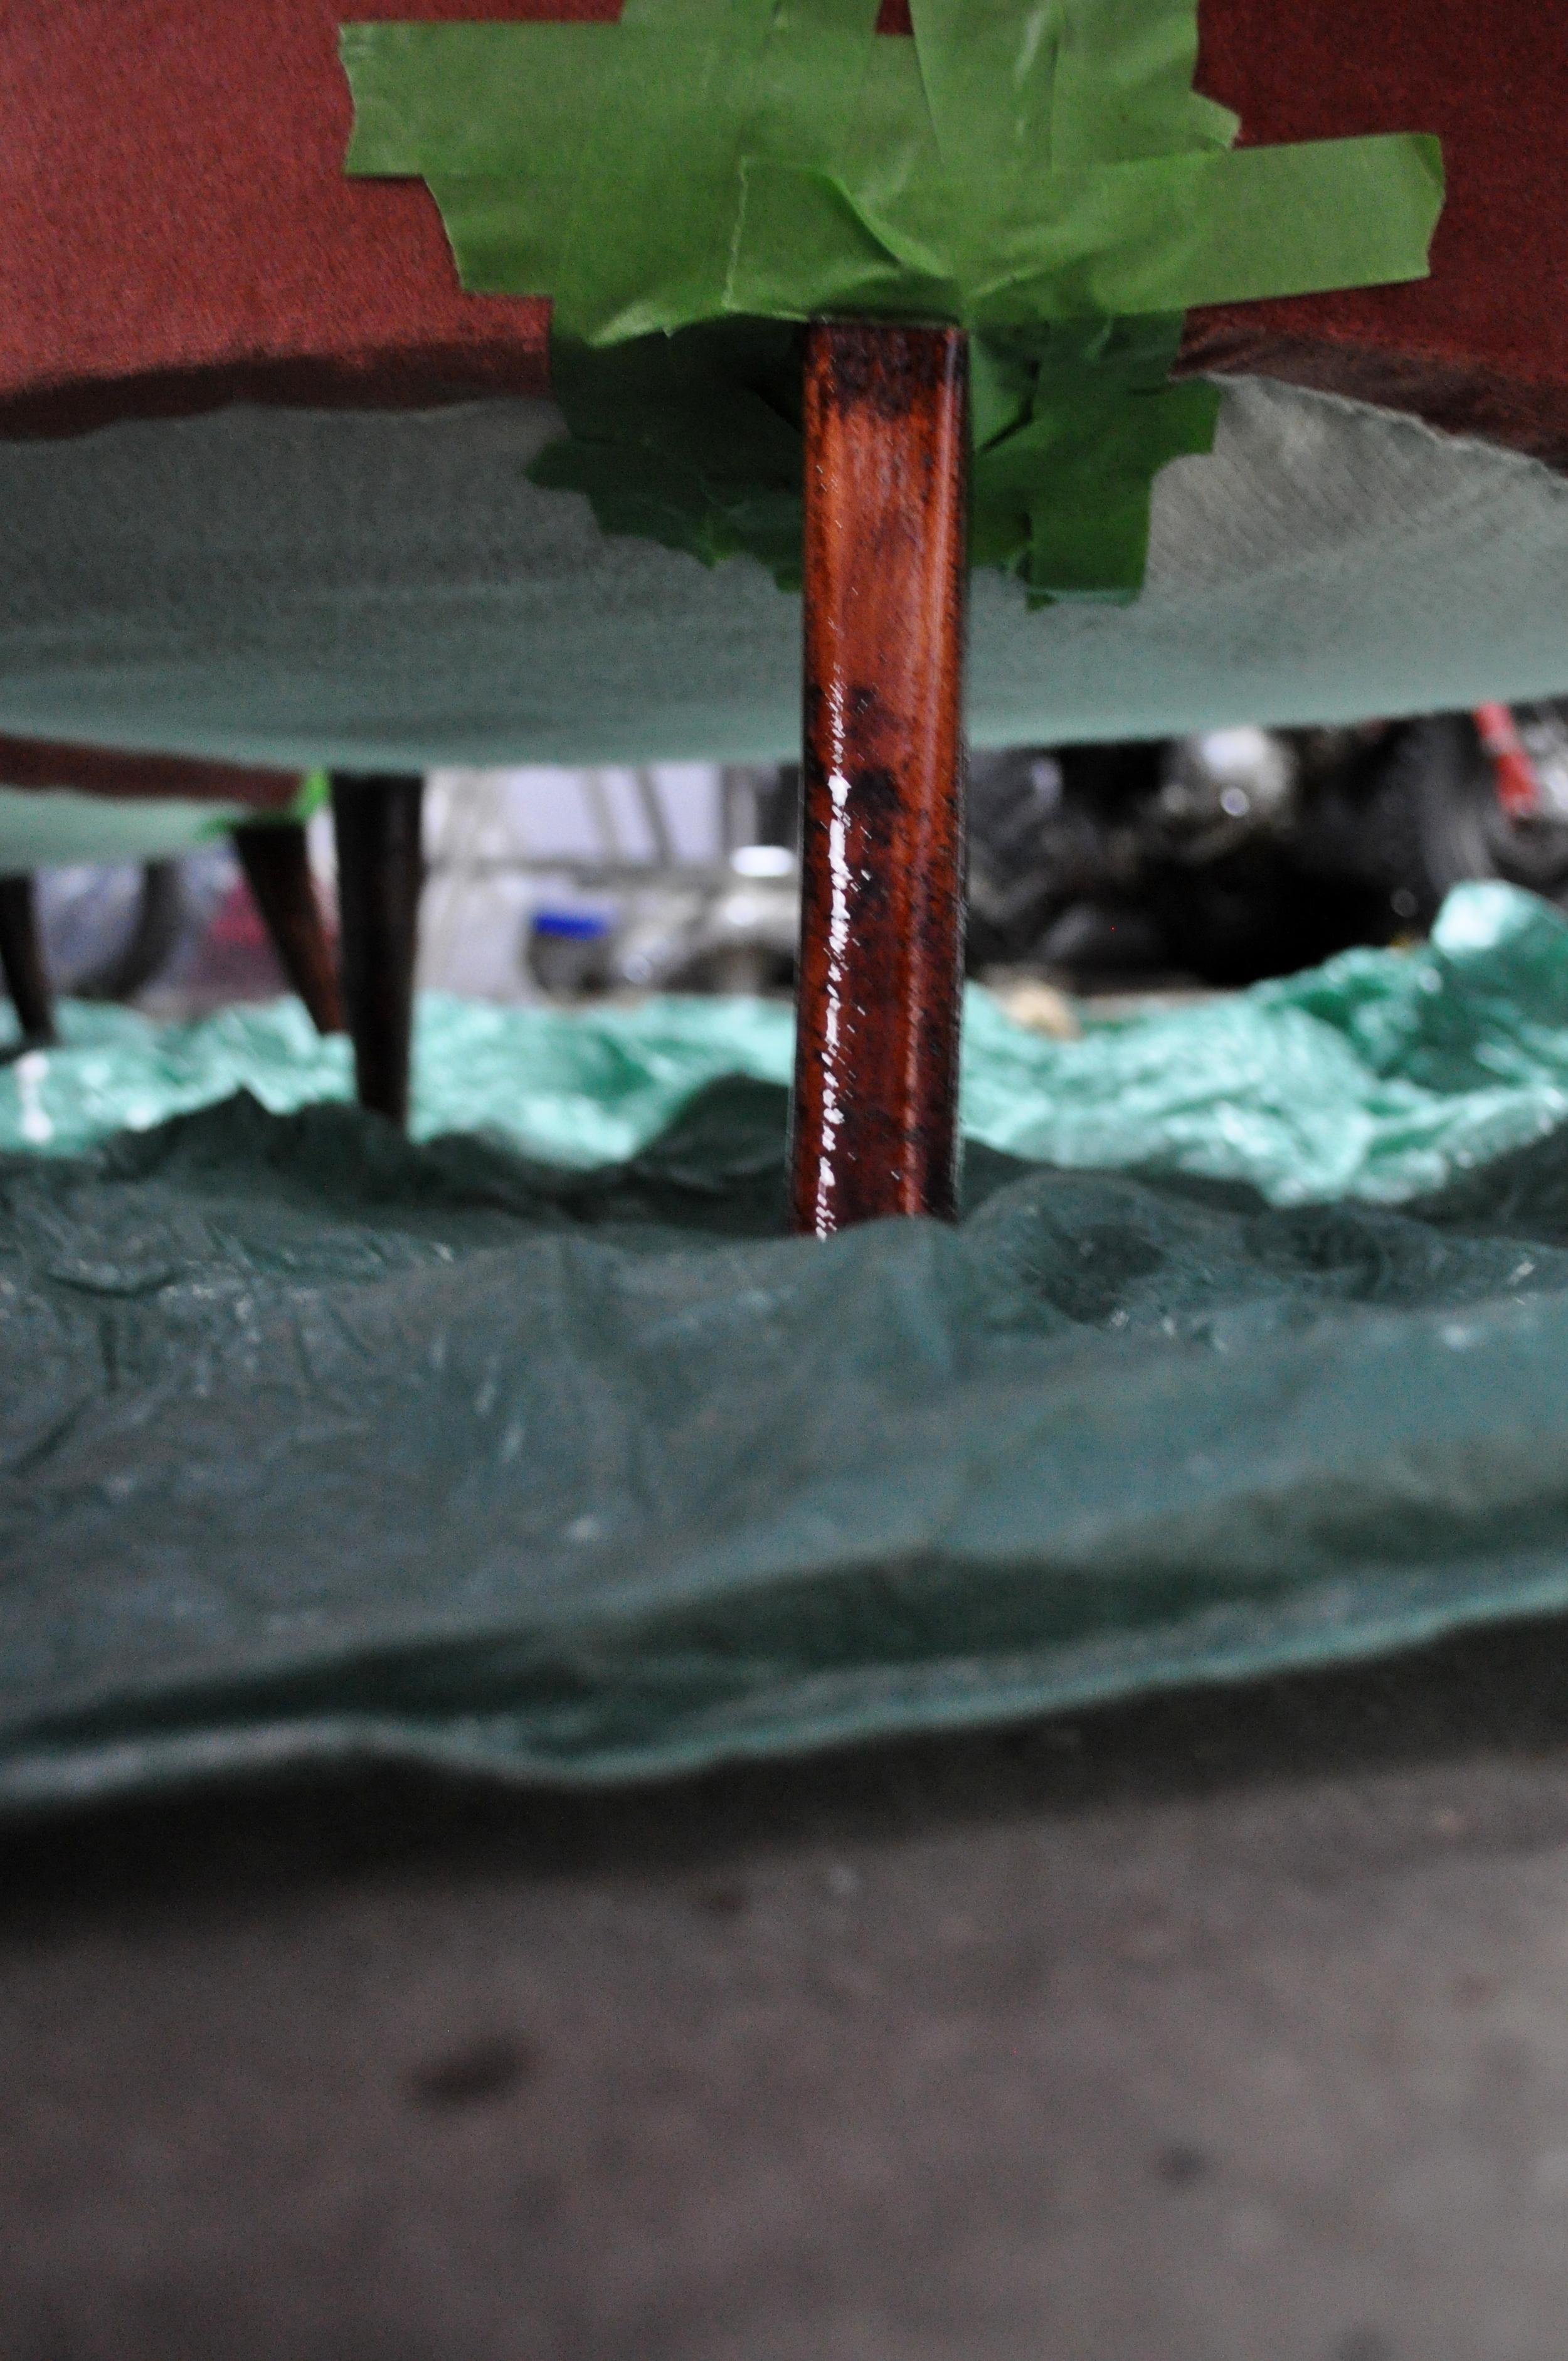 Stripping the varnish